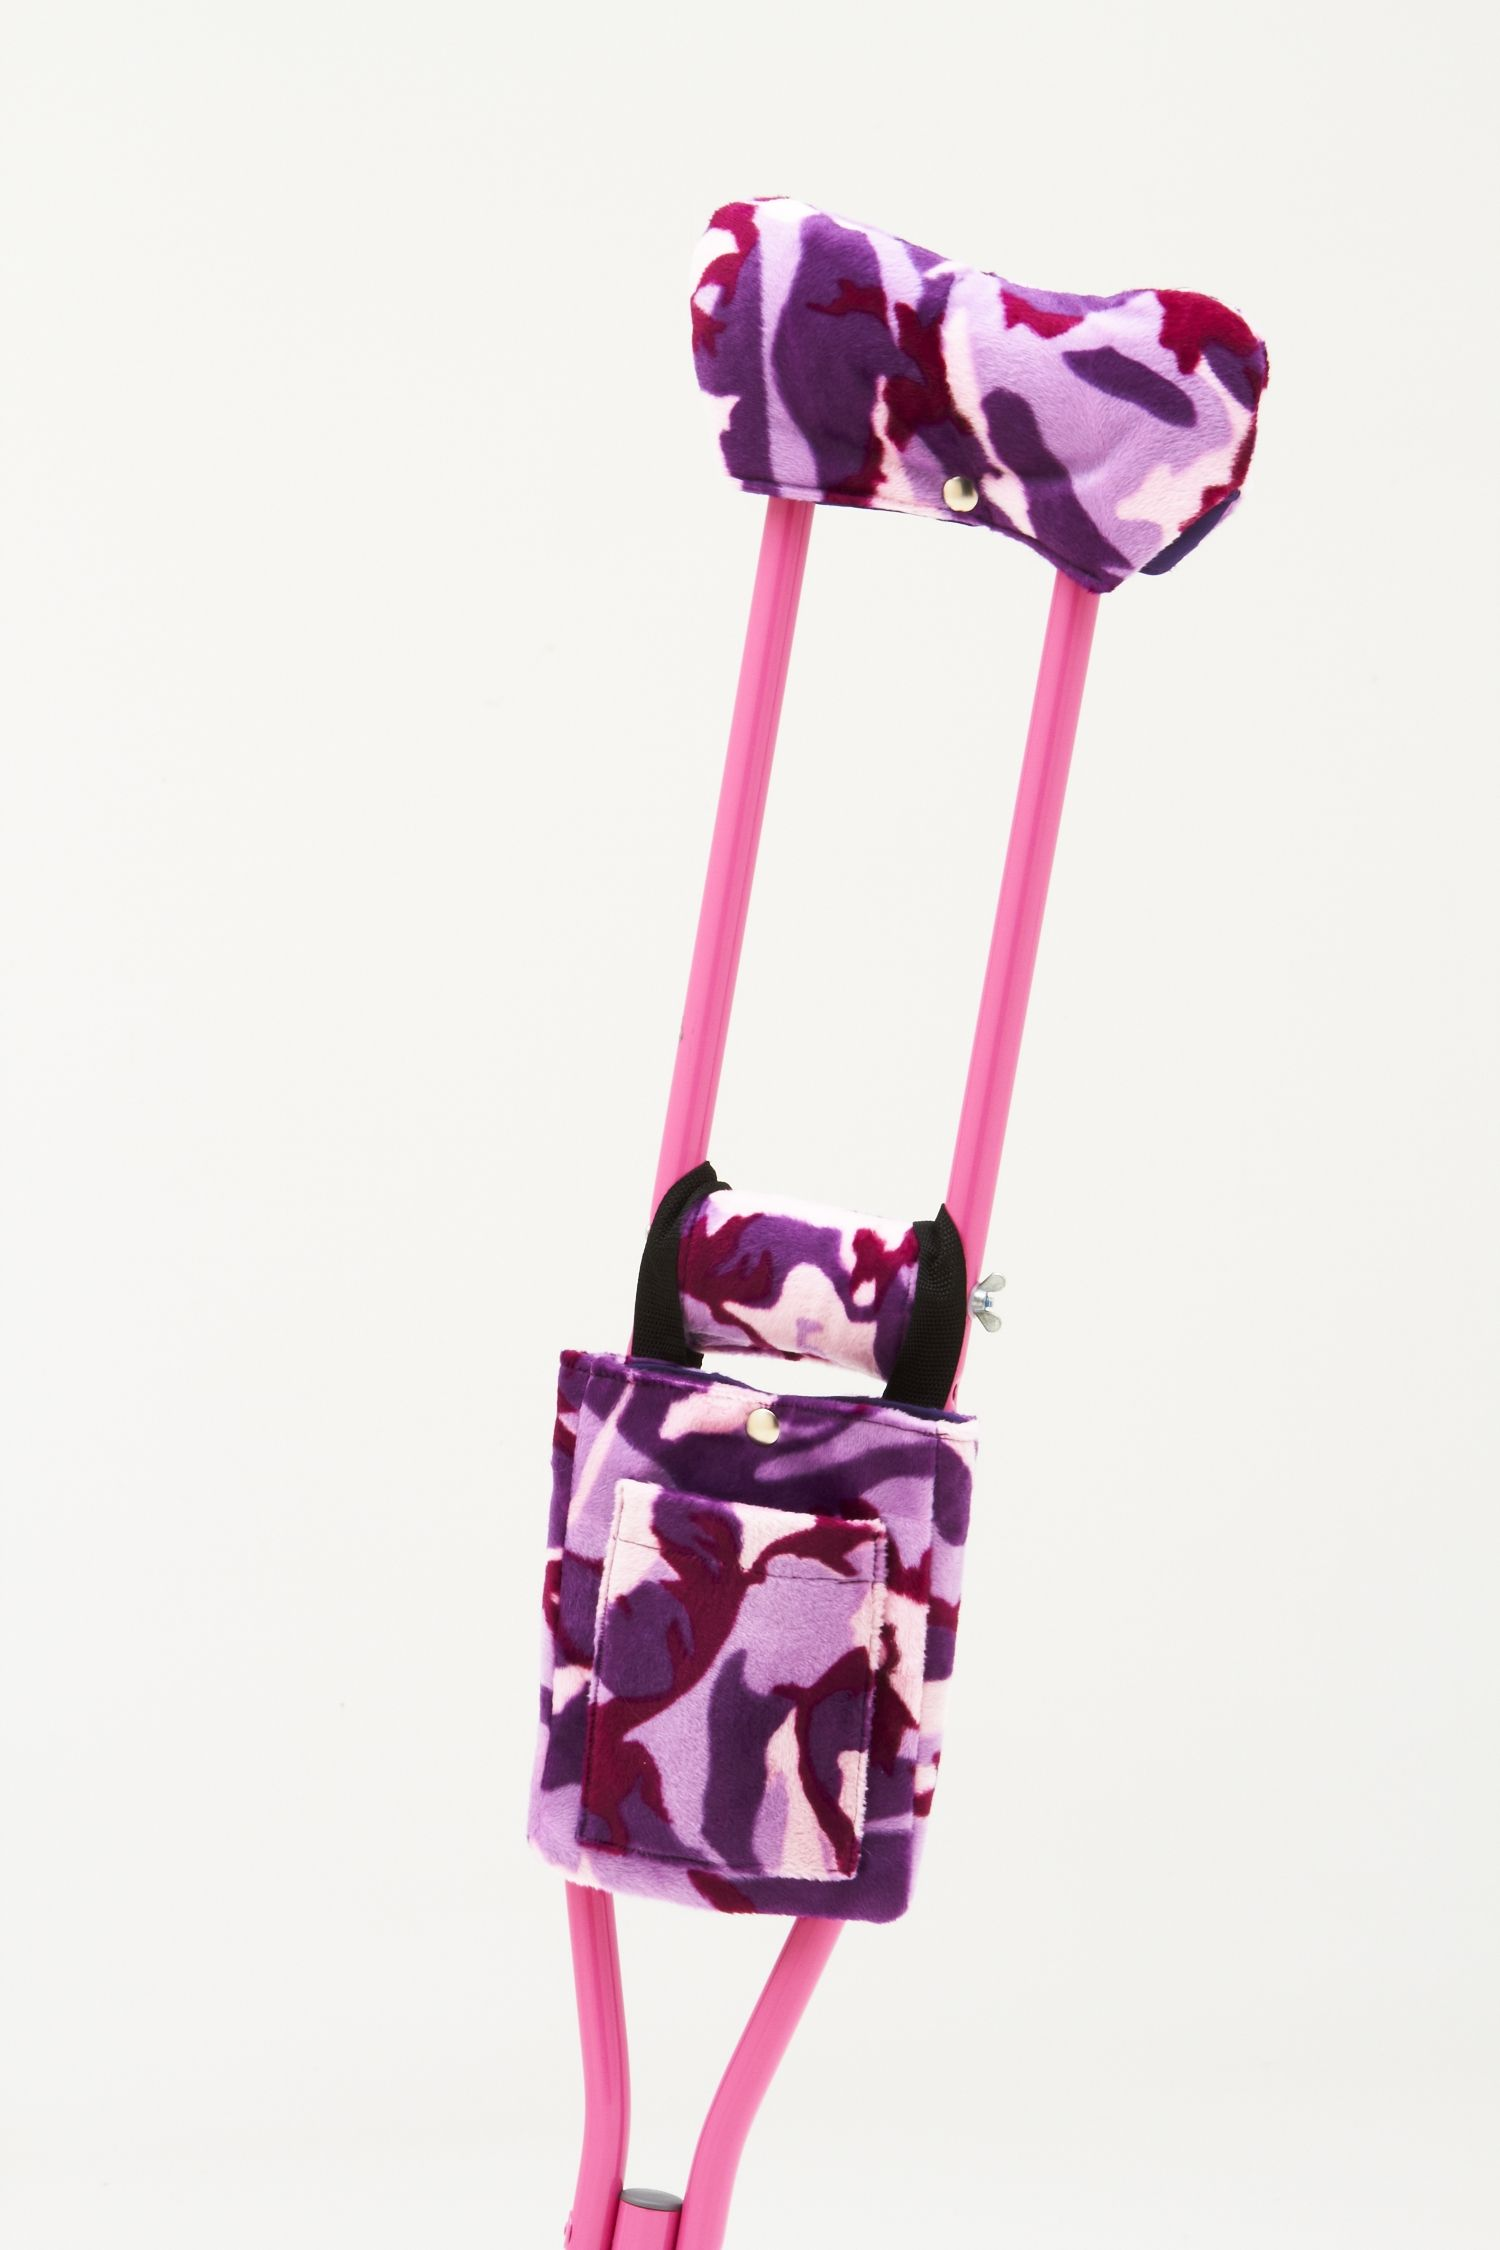 Standard Crutchwear Prints Crutch Covers Crutch Bags Crutches Diy